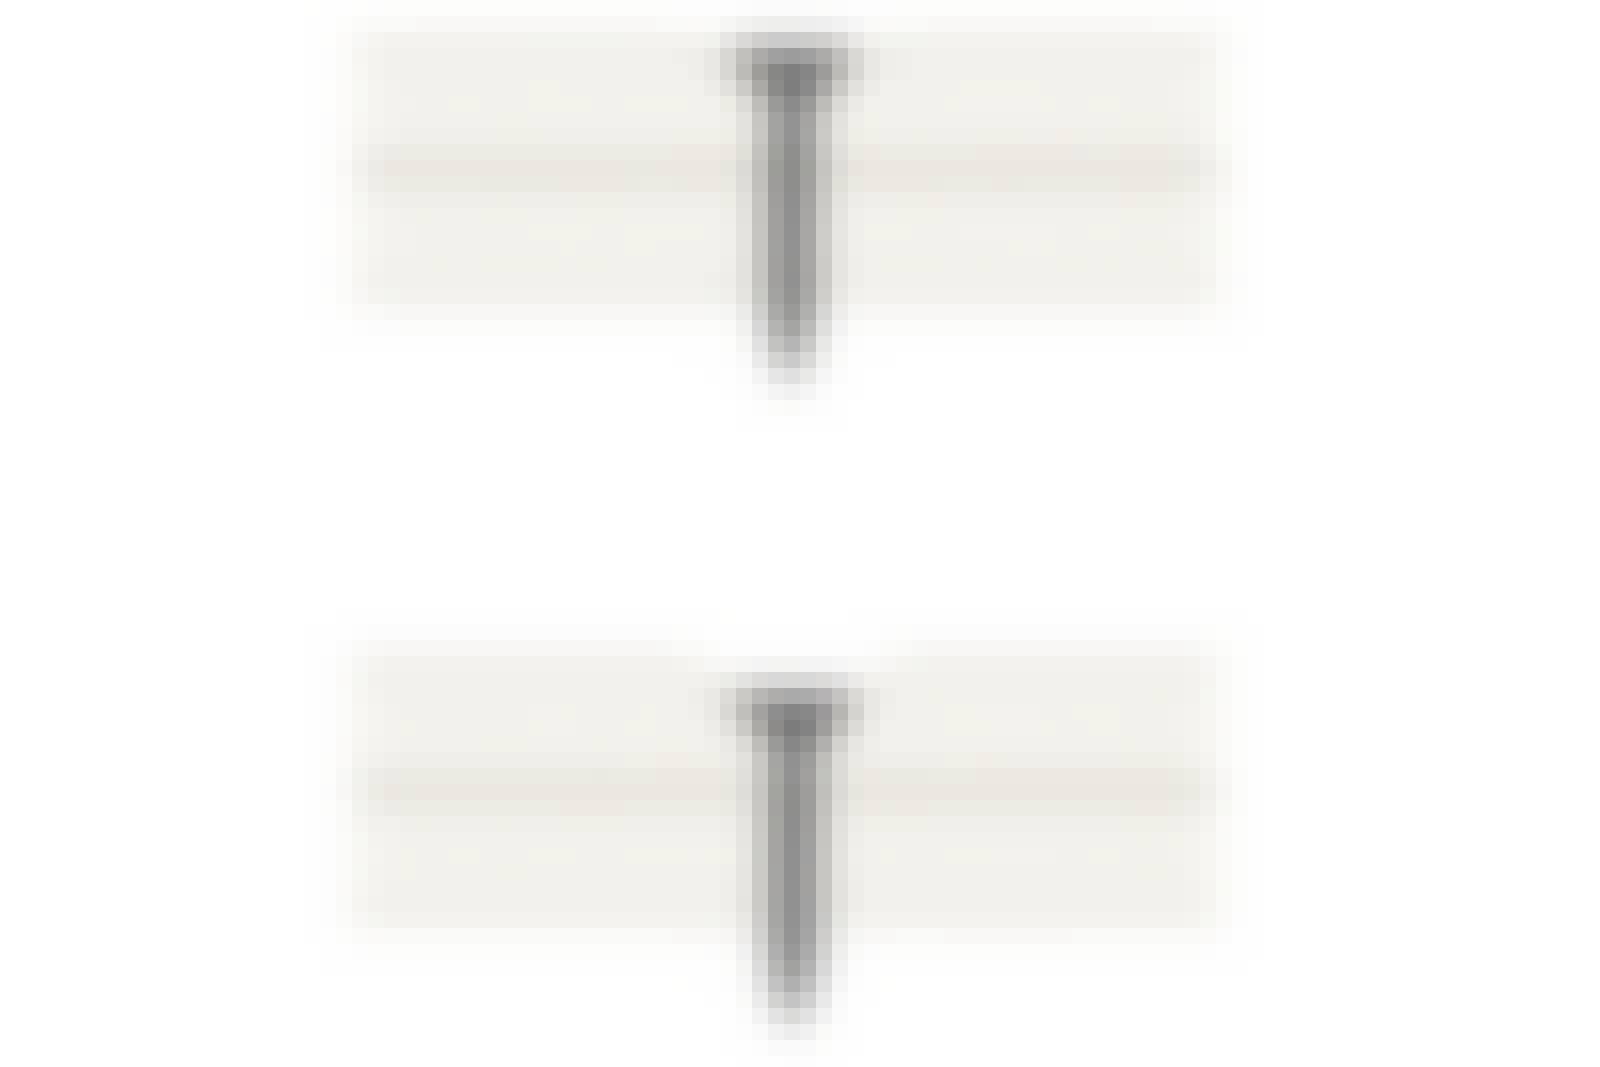 Gipsskruemaskine: Korrekt montering af gipsskrue med en gipsskruemaskine